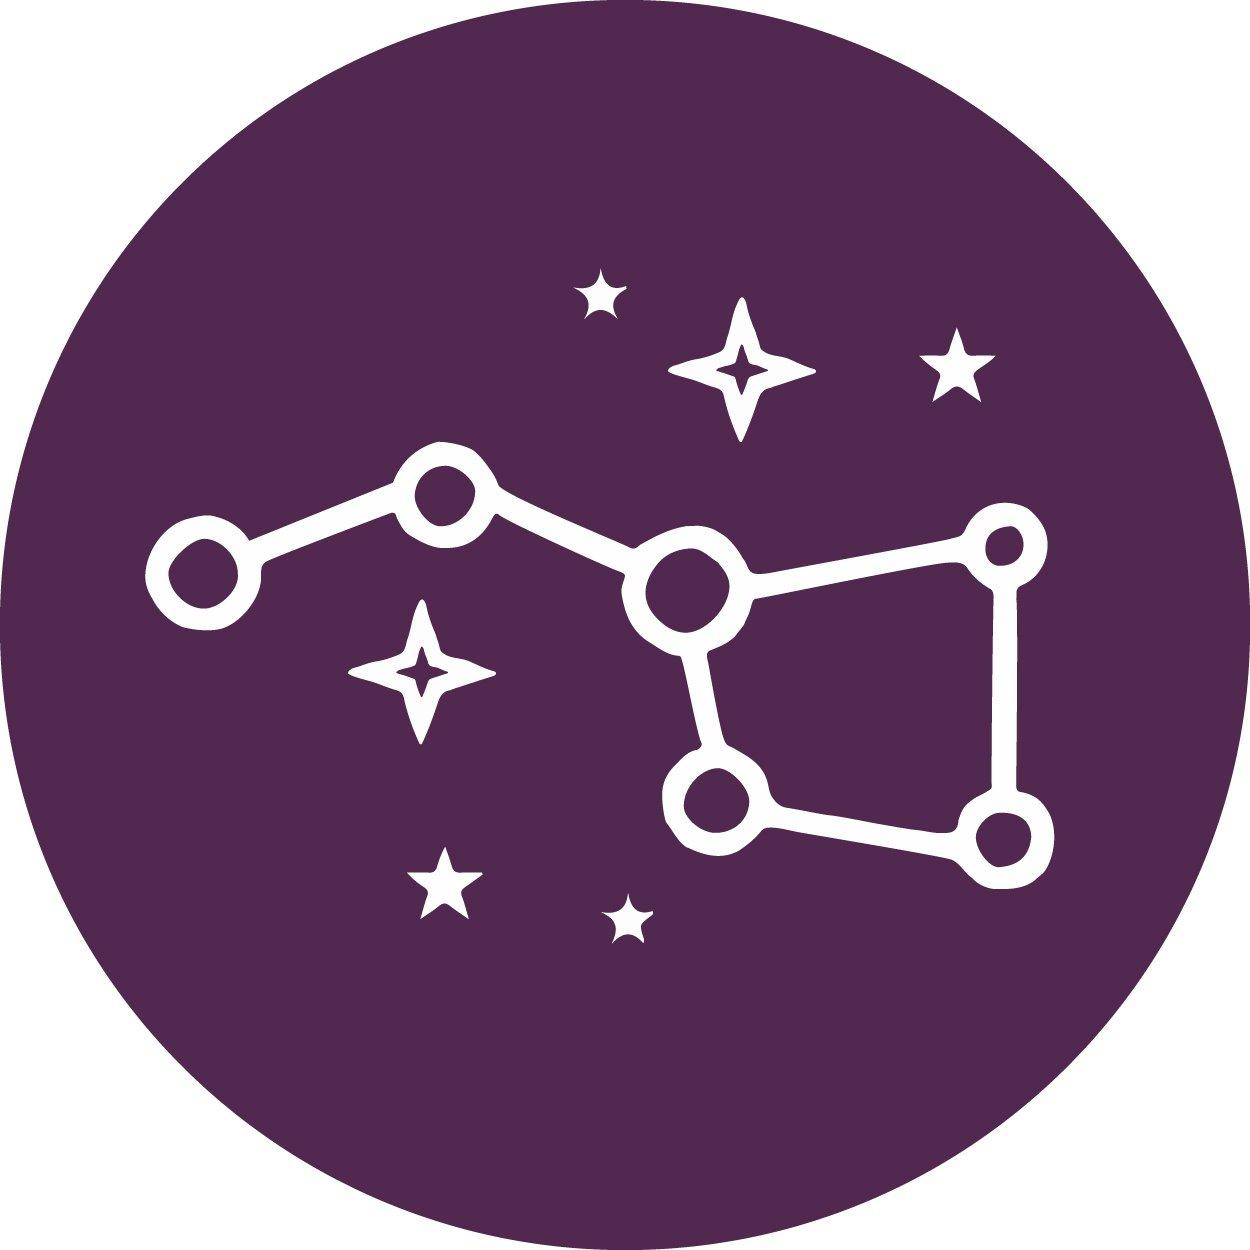 Pleidian-Icon-Purple-Circle.jpg